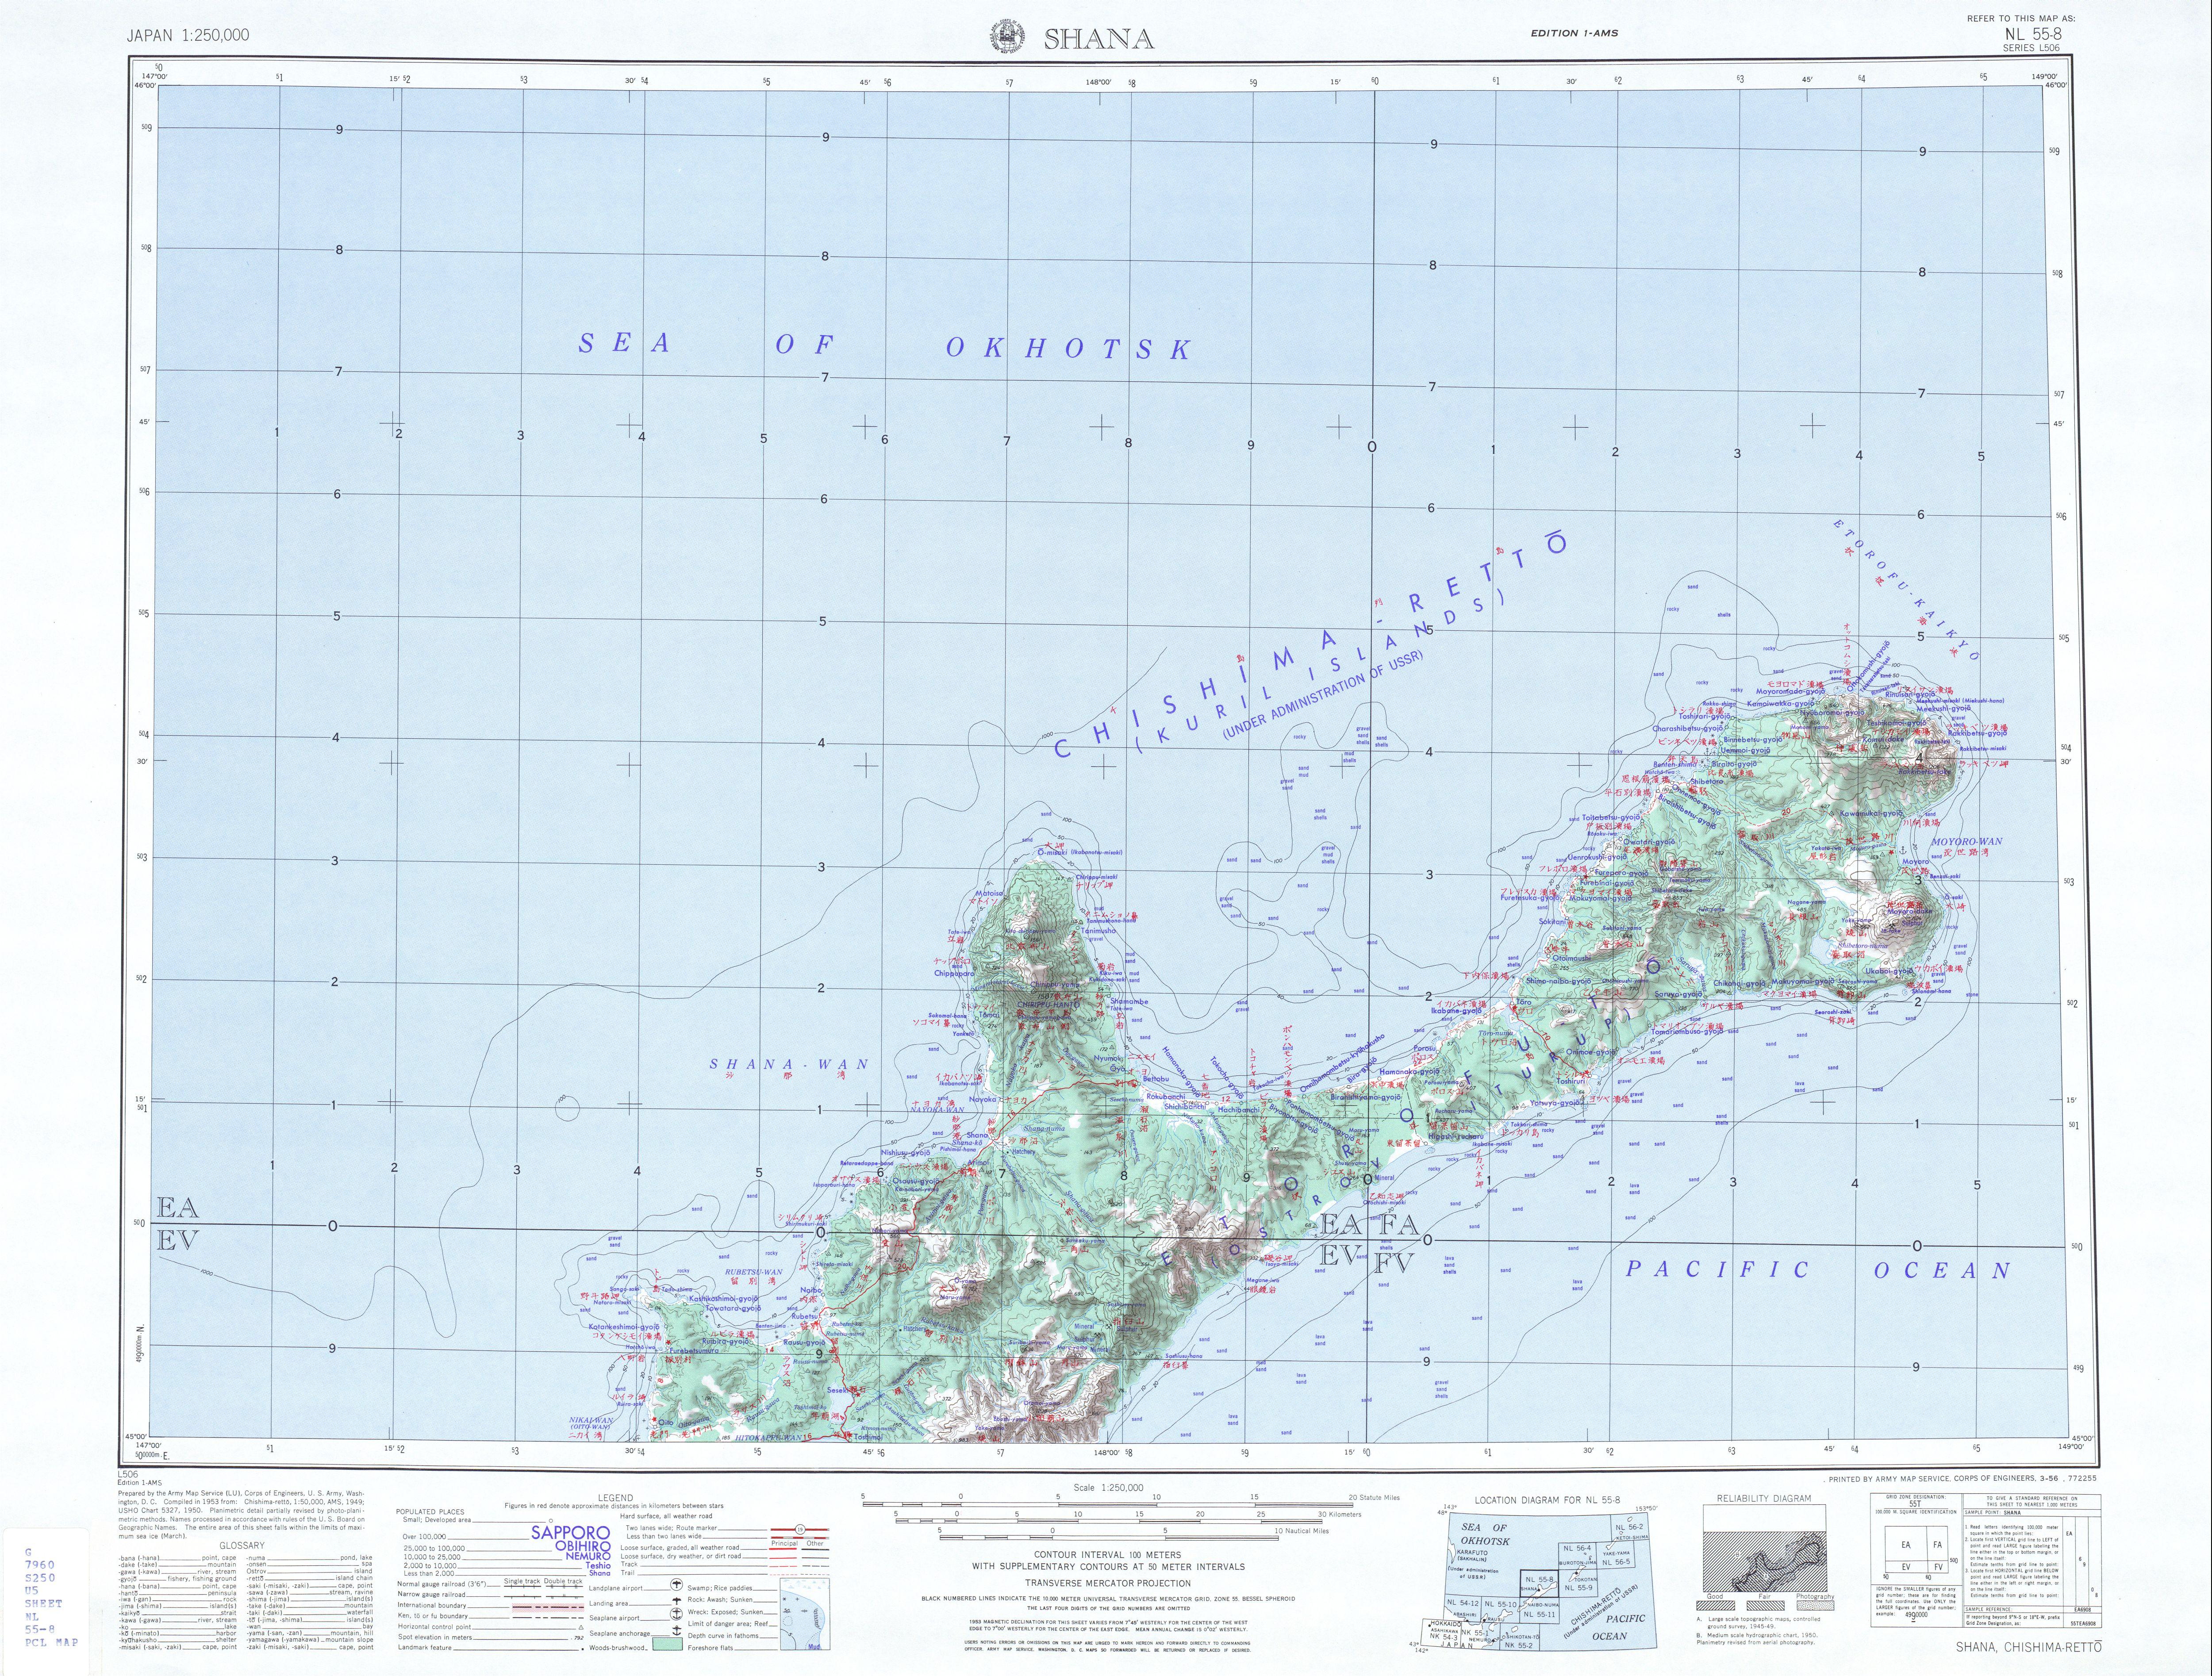 Shana Topographic Map Sheet, Japan 1954